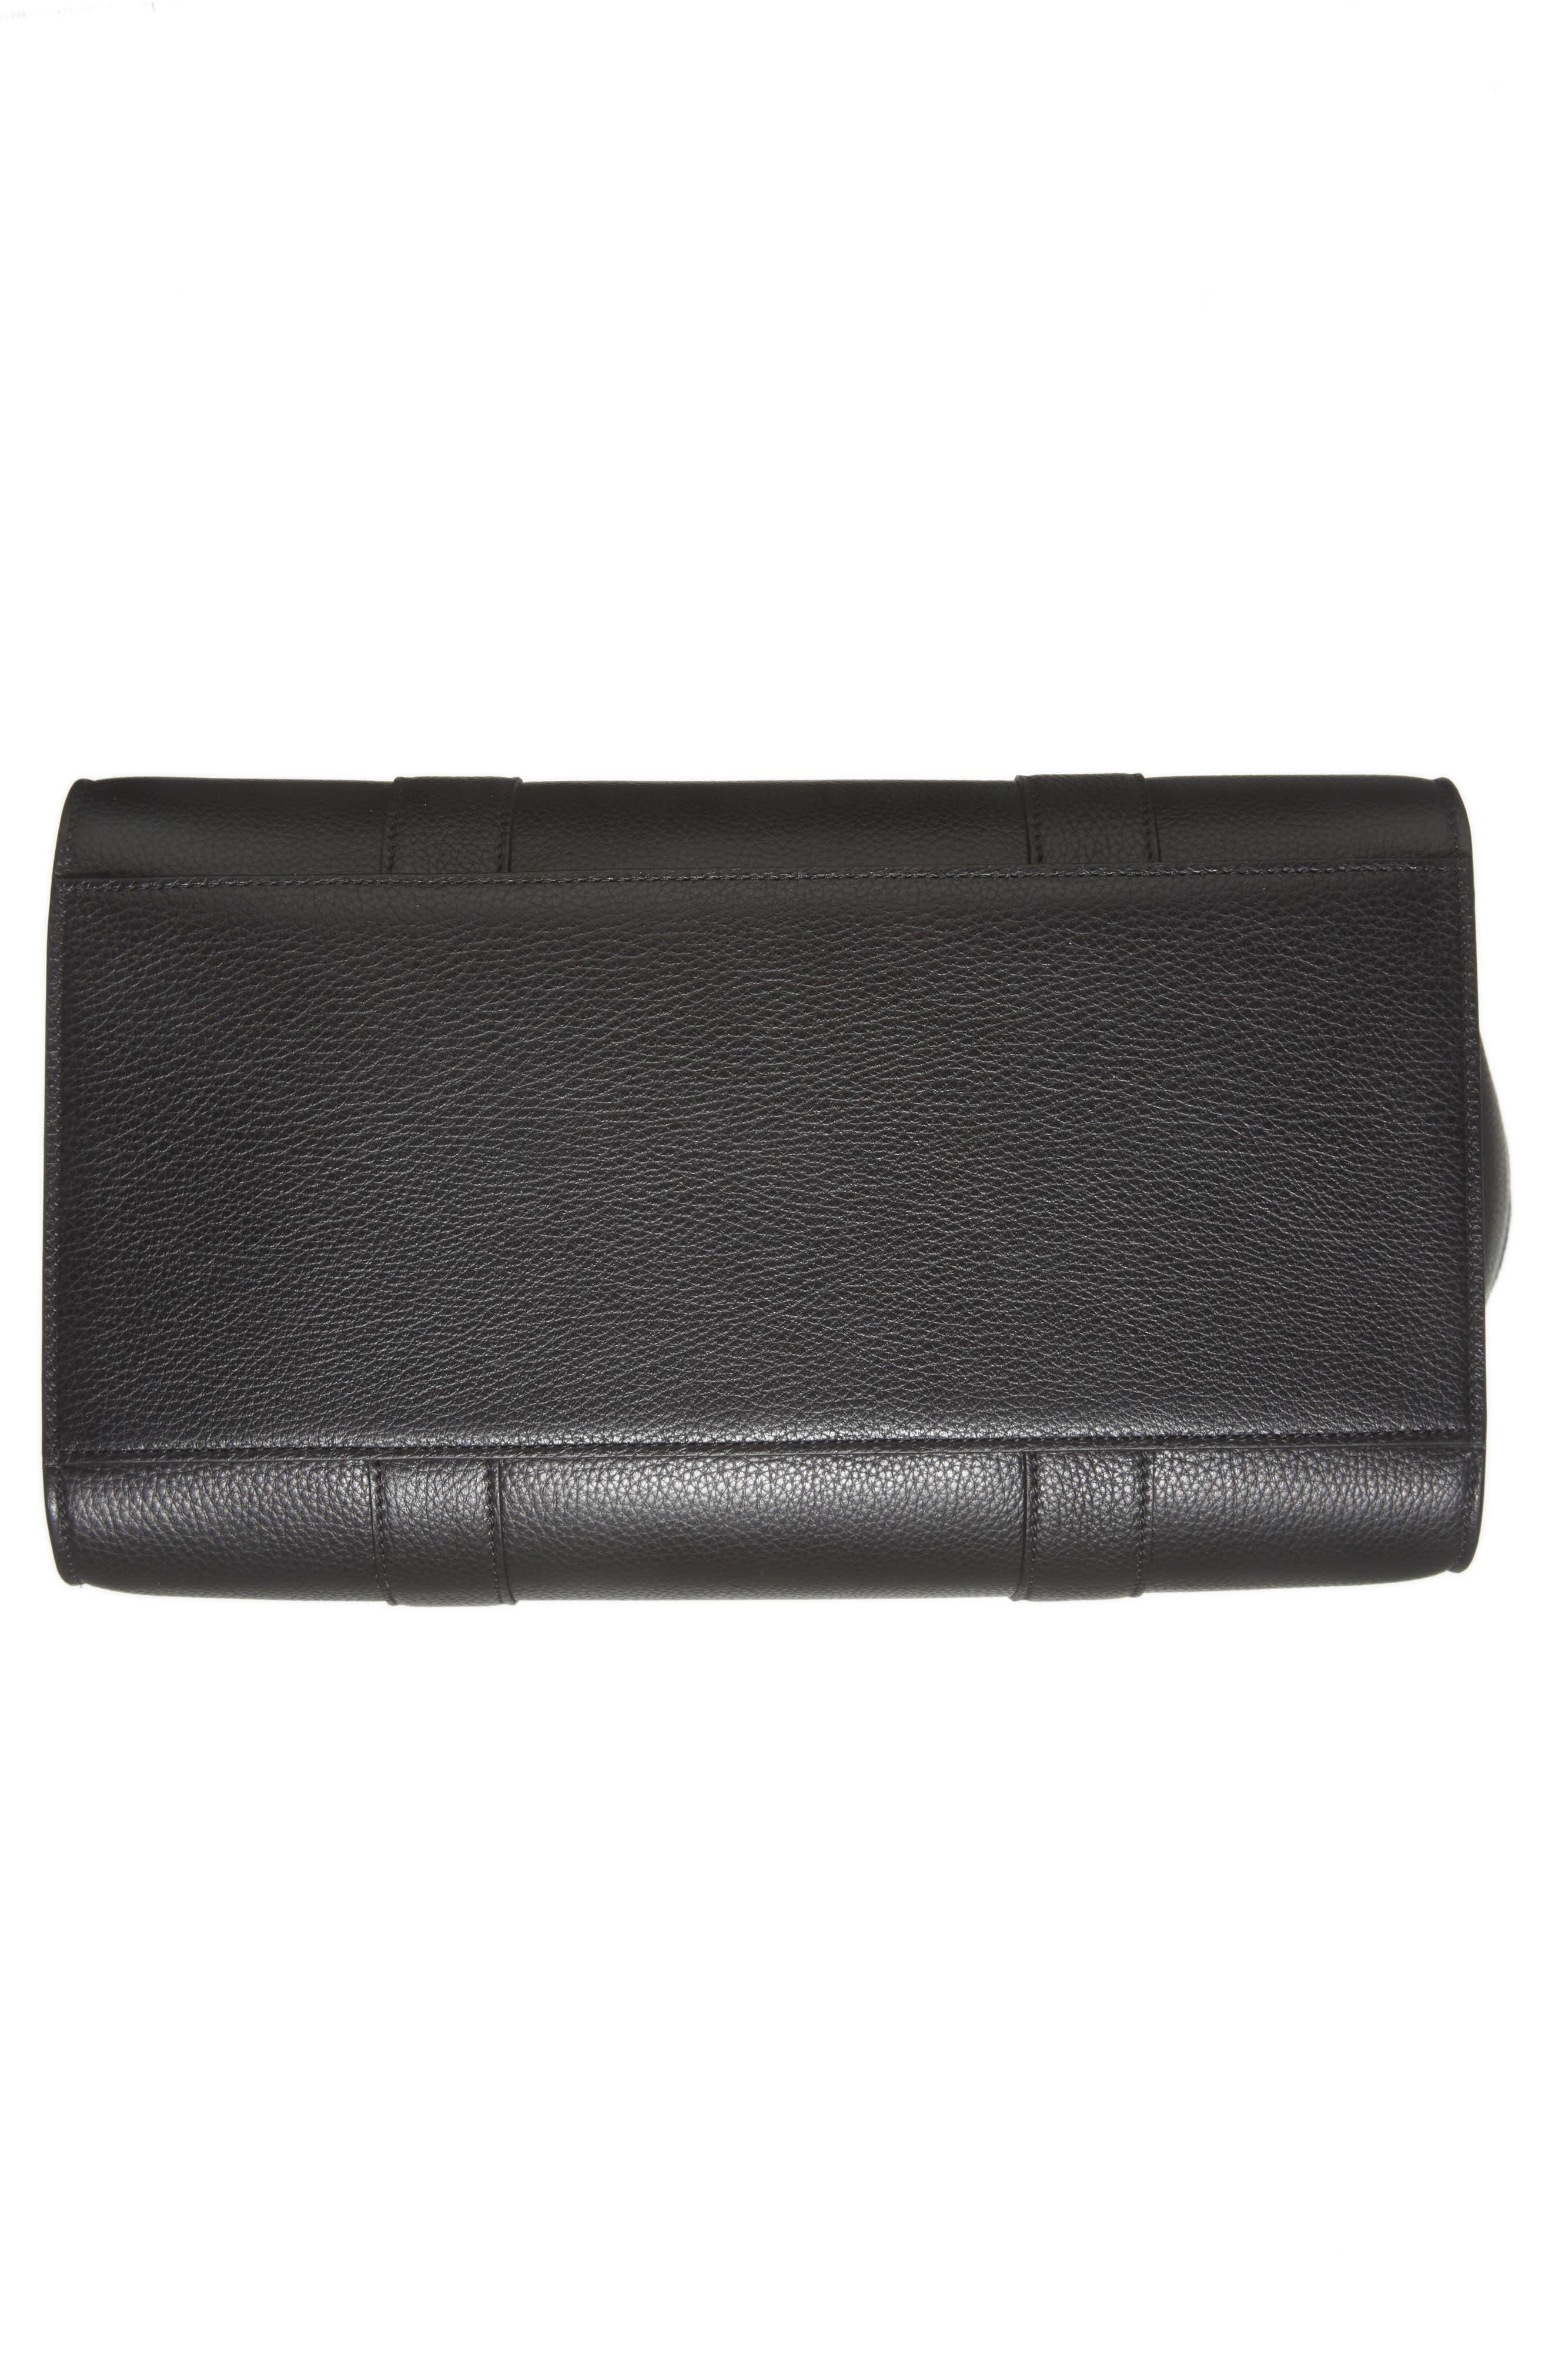 Large Bayswater Leather Tote,                             Alternate thumbnail 6, color,                             BLACK/ BLACK